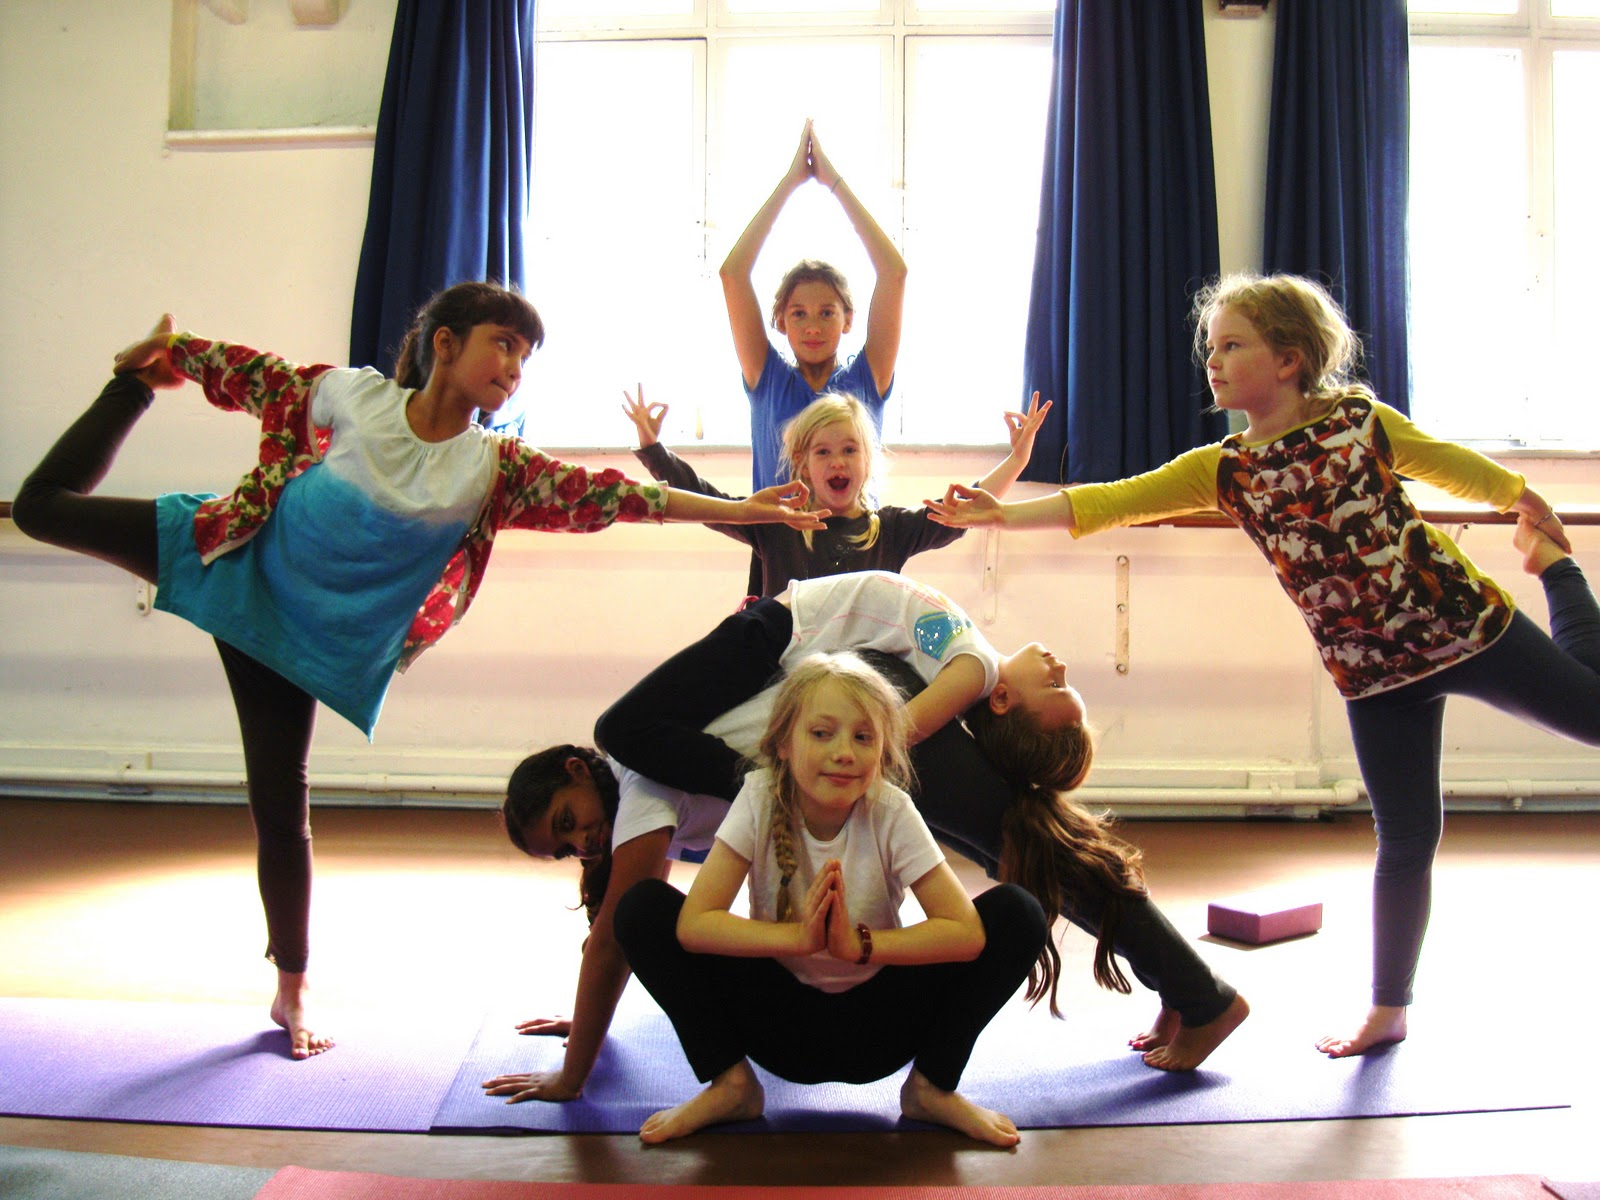 fun-yoga-poses-for-kids-fnxgt5ot